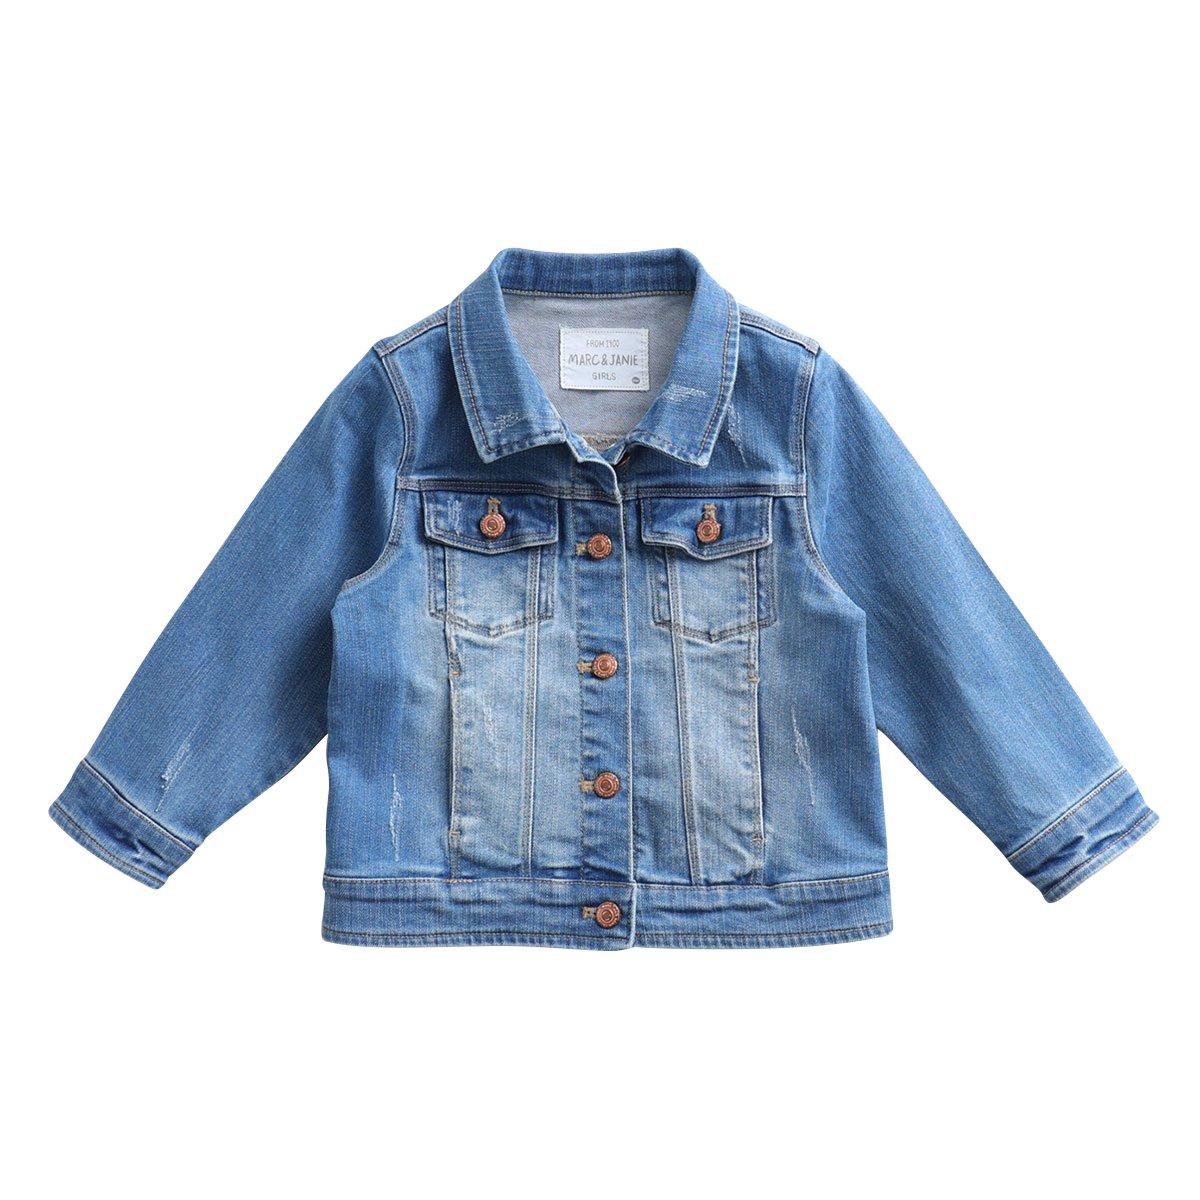 marc janie Baby Toddler Girls' Coat Knit Pre-Washed Denim Jacket Blue 18728 8T (130 cm)